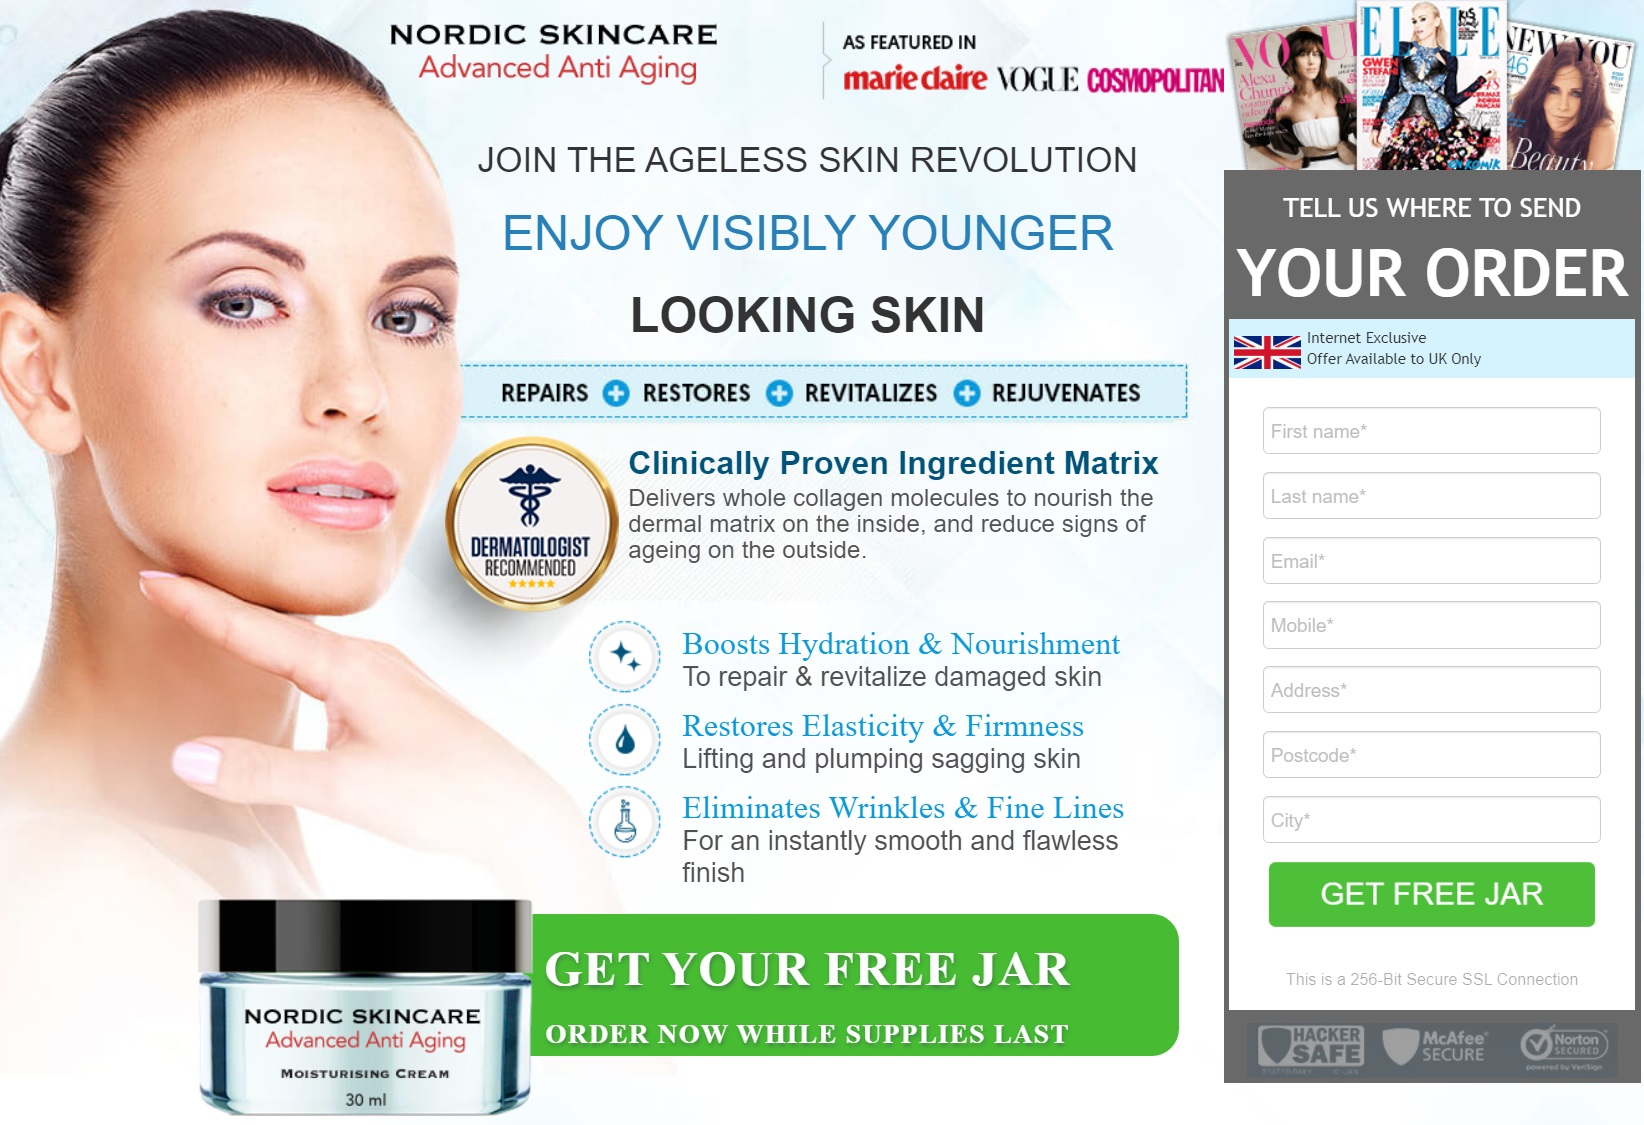 Nordic SkinCare Advanced Anti Aging